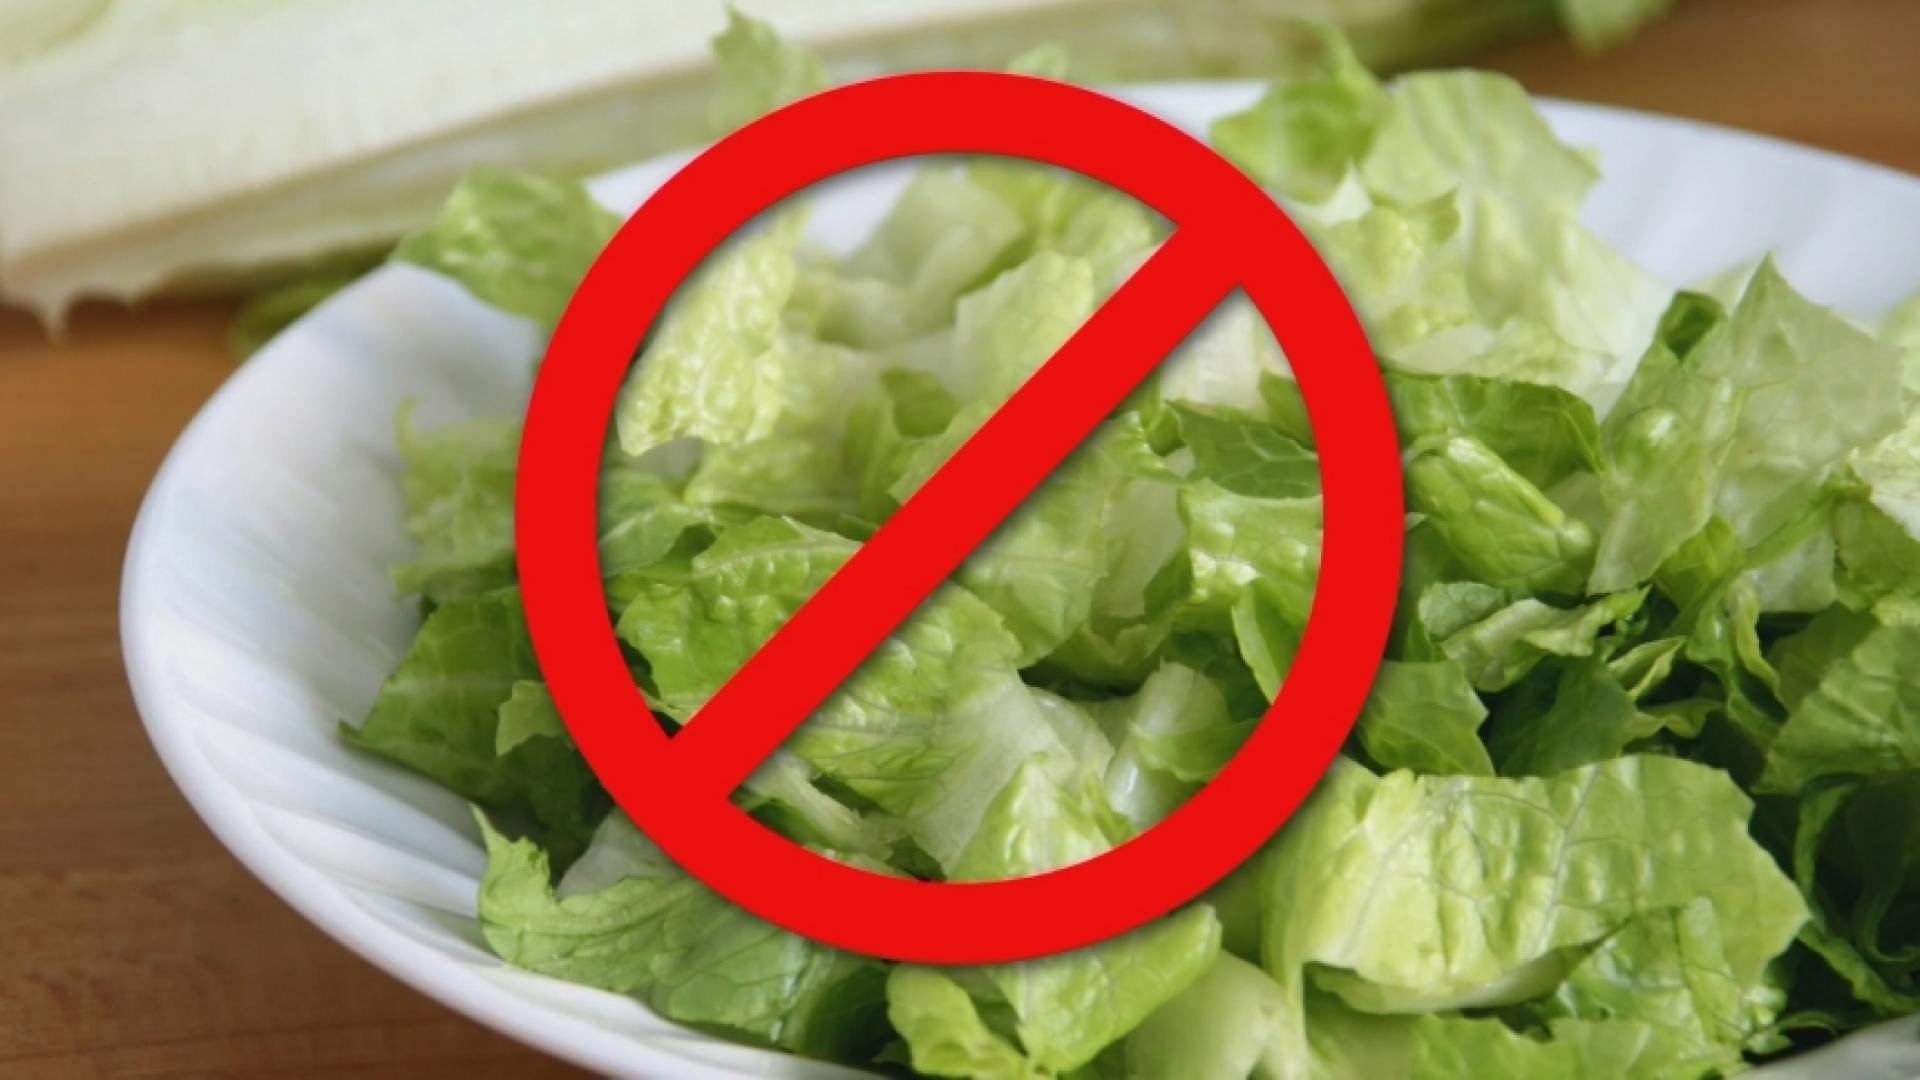 NC_lettuceecoli_1920x1080_1542814067676.jpg